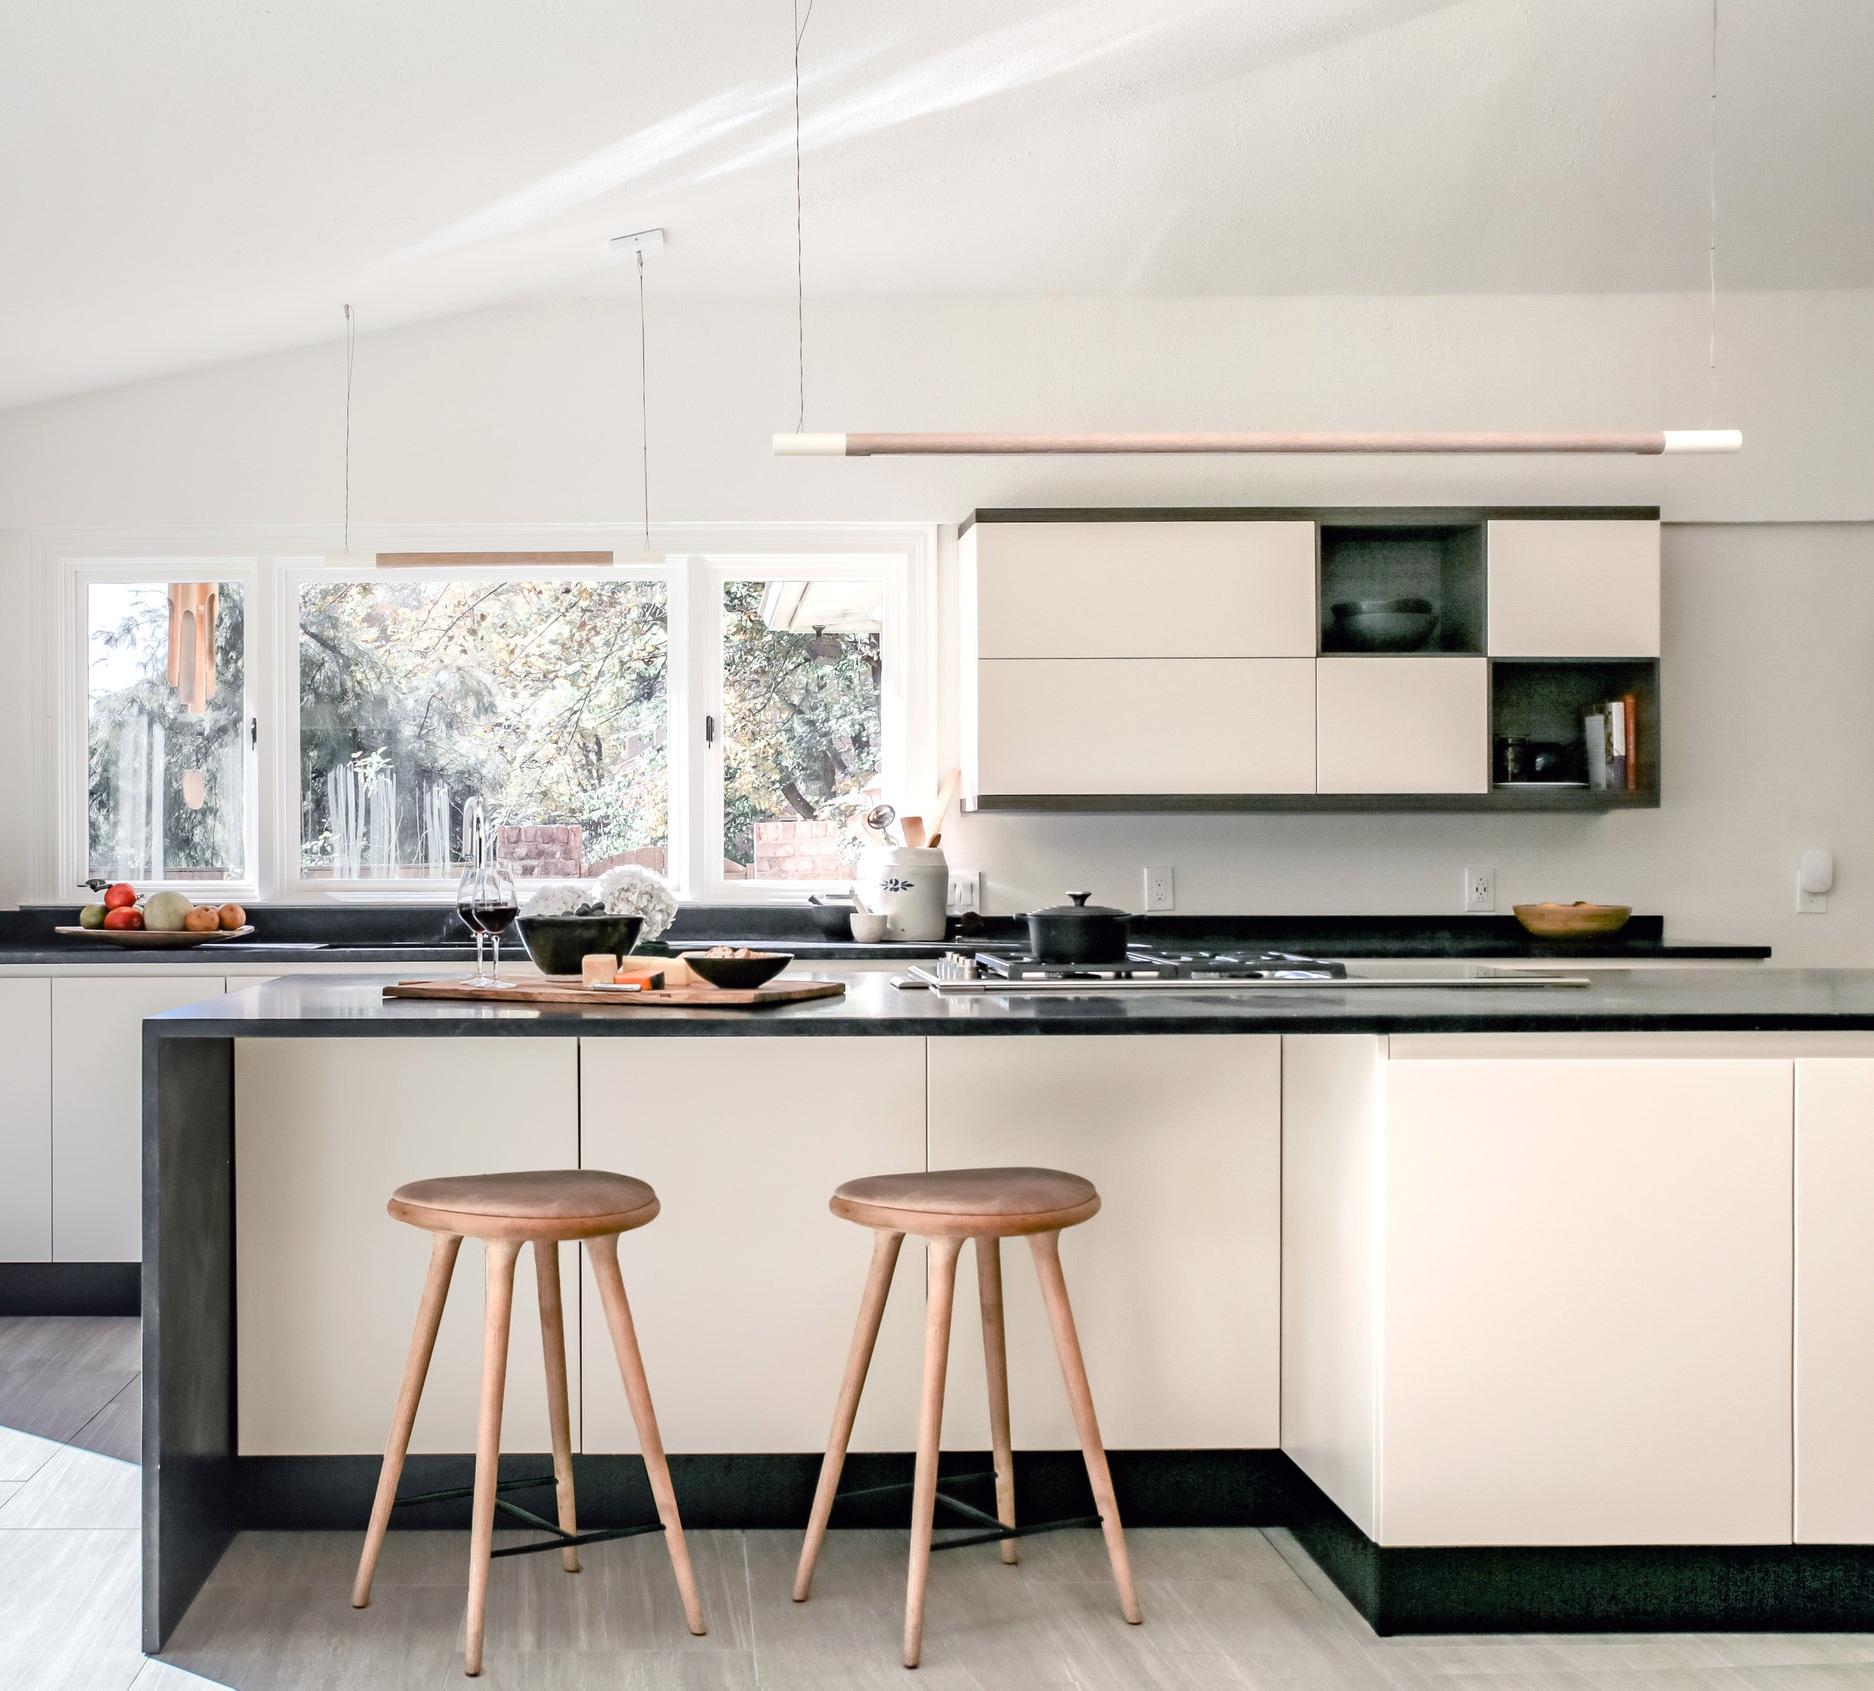 Hendricks+Interiors+-+Potomoc+Kitchen-Amanda+Archibald+%40fotosynthesis+1.jpg